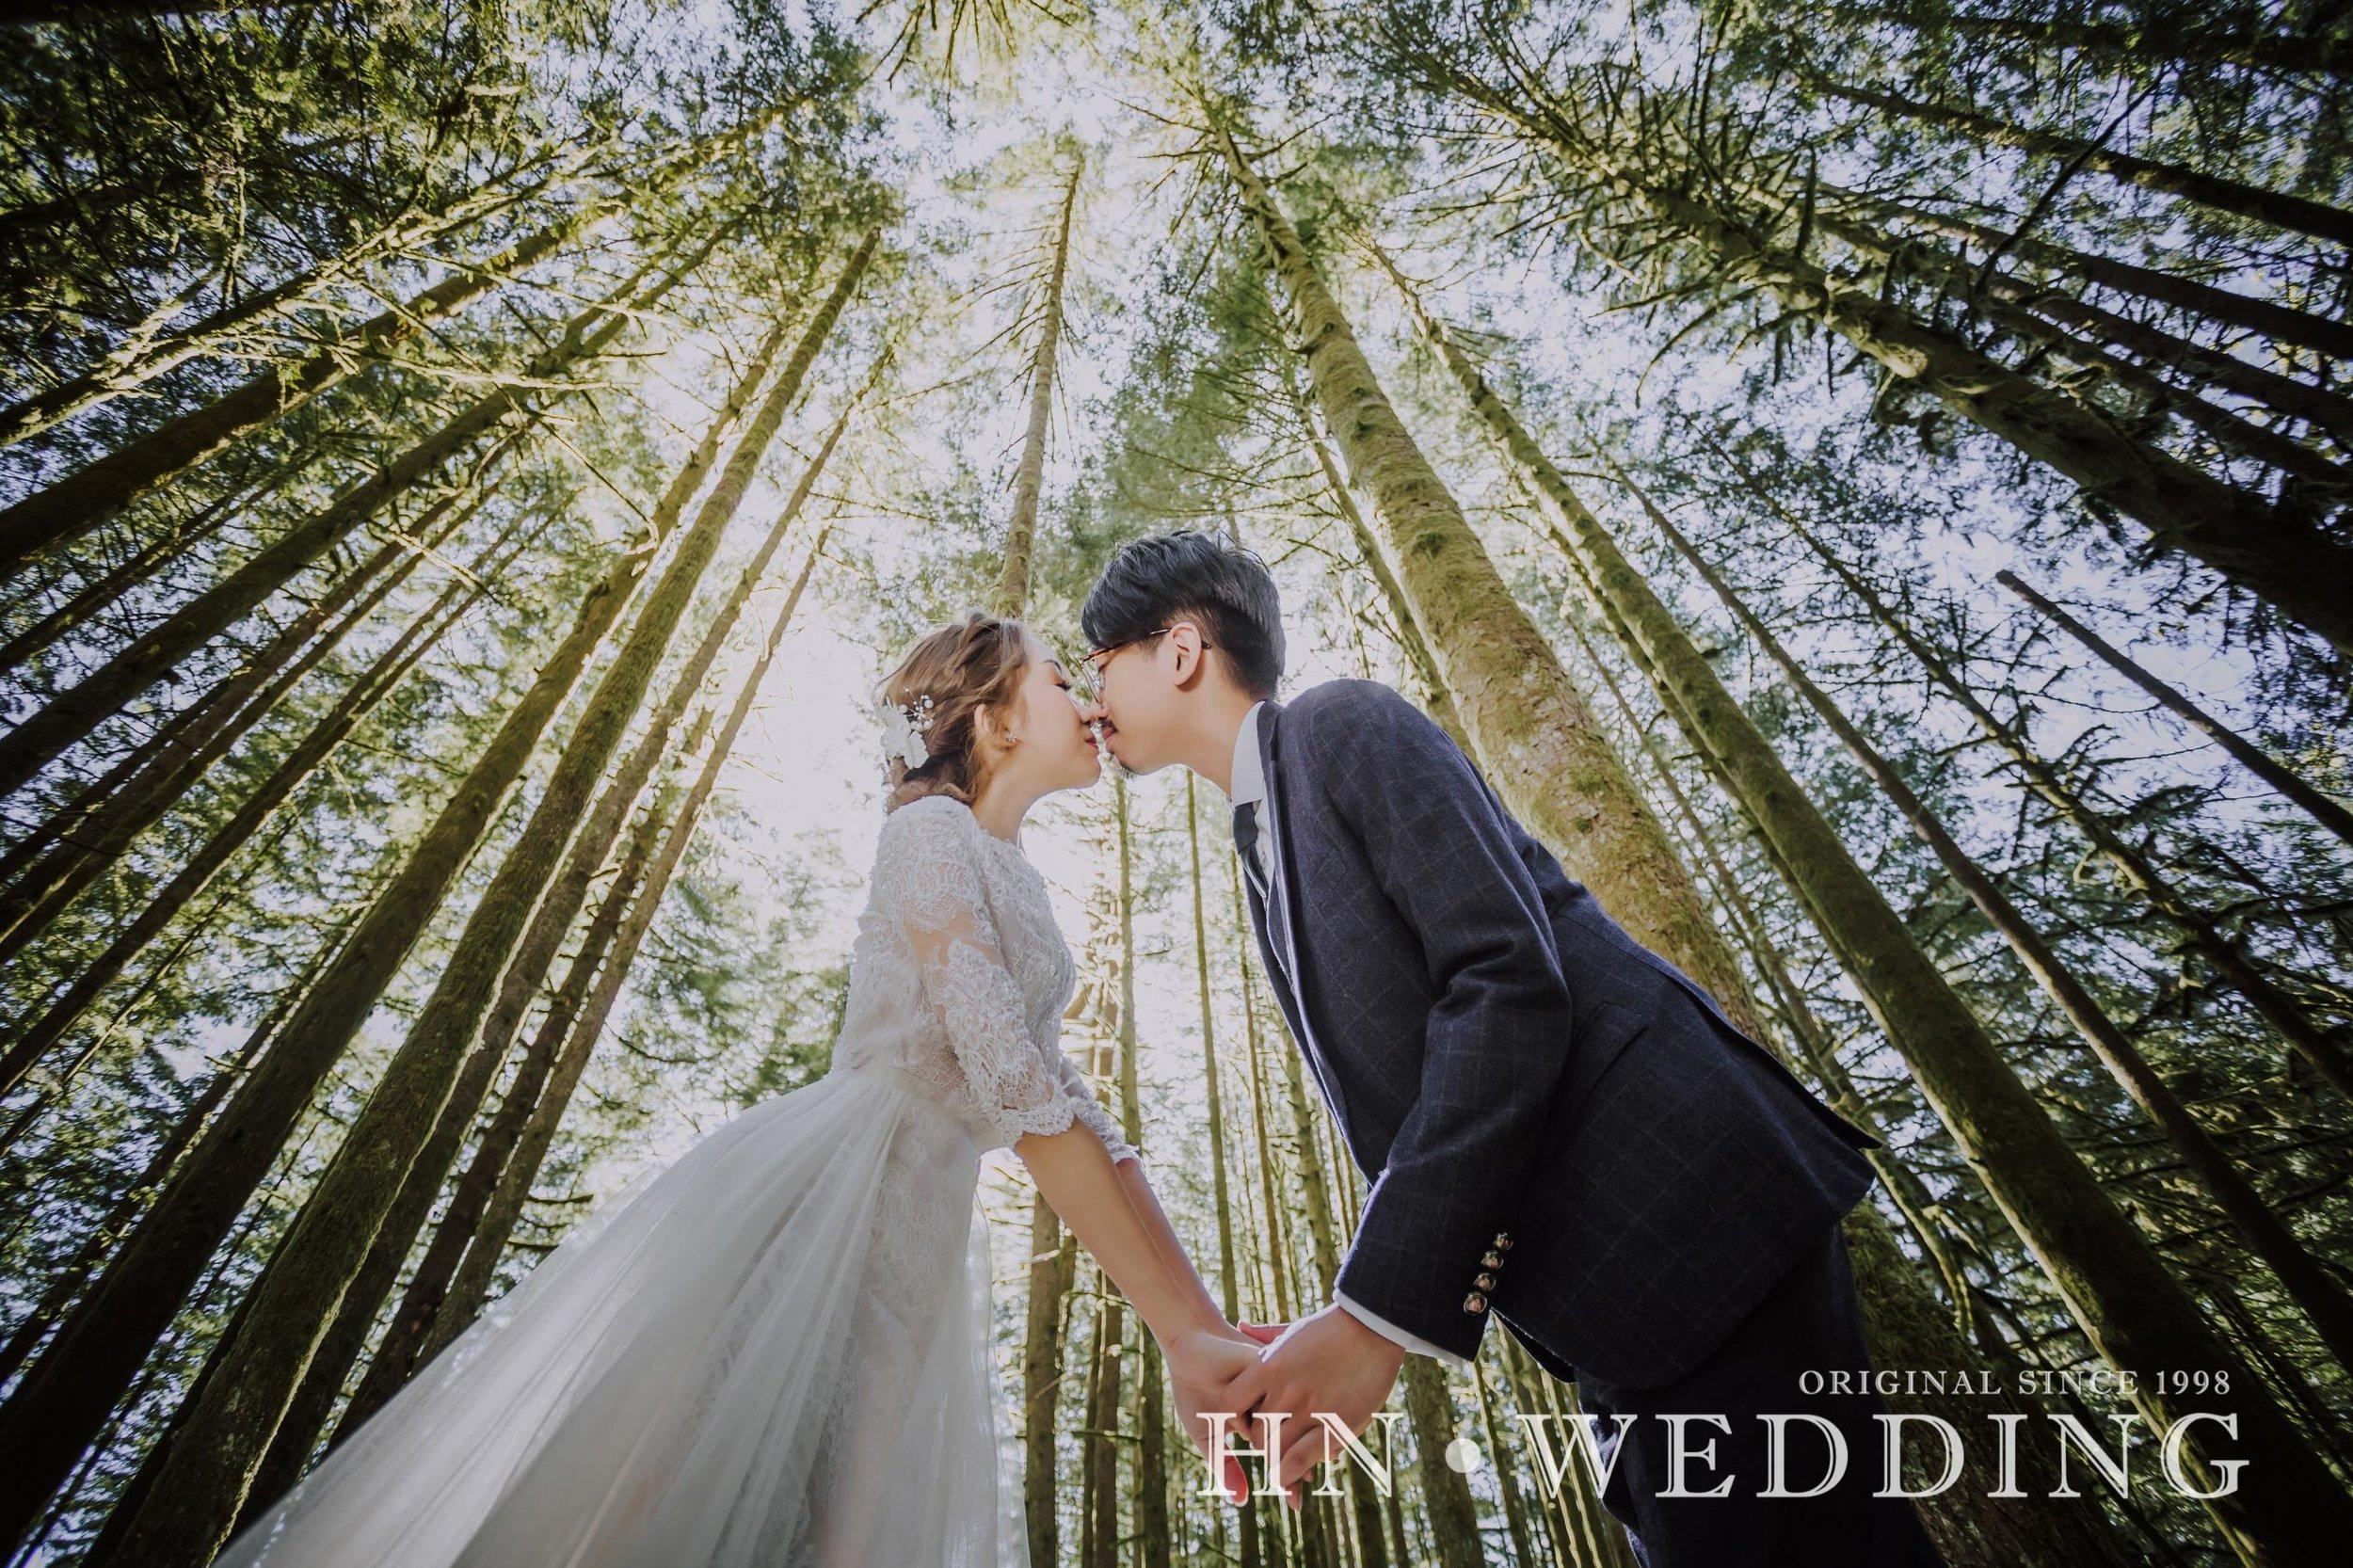 hnweddingweddingdayA&R-12.jpg